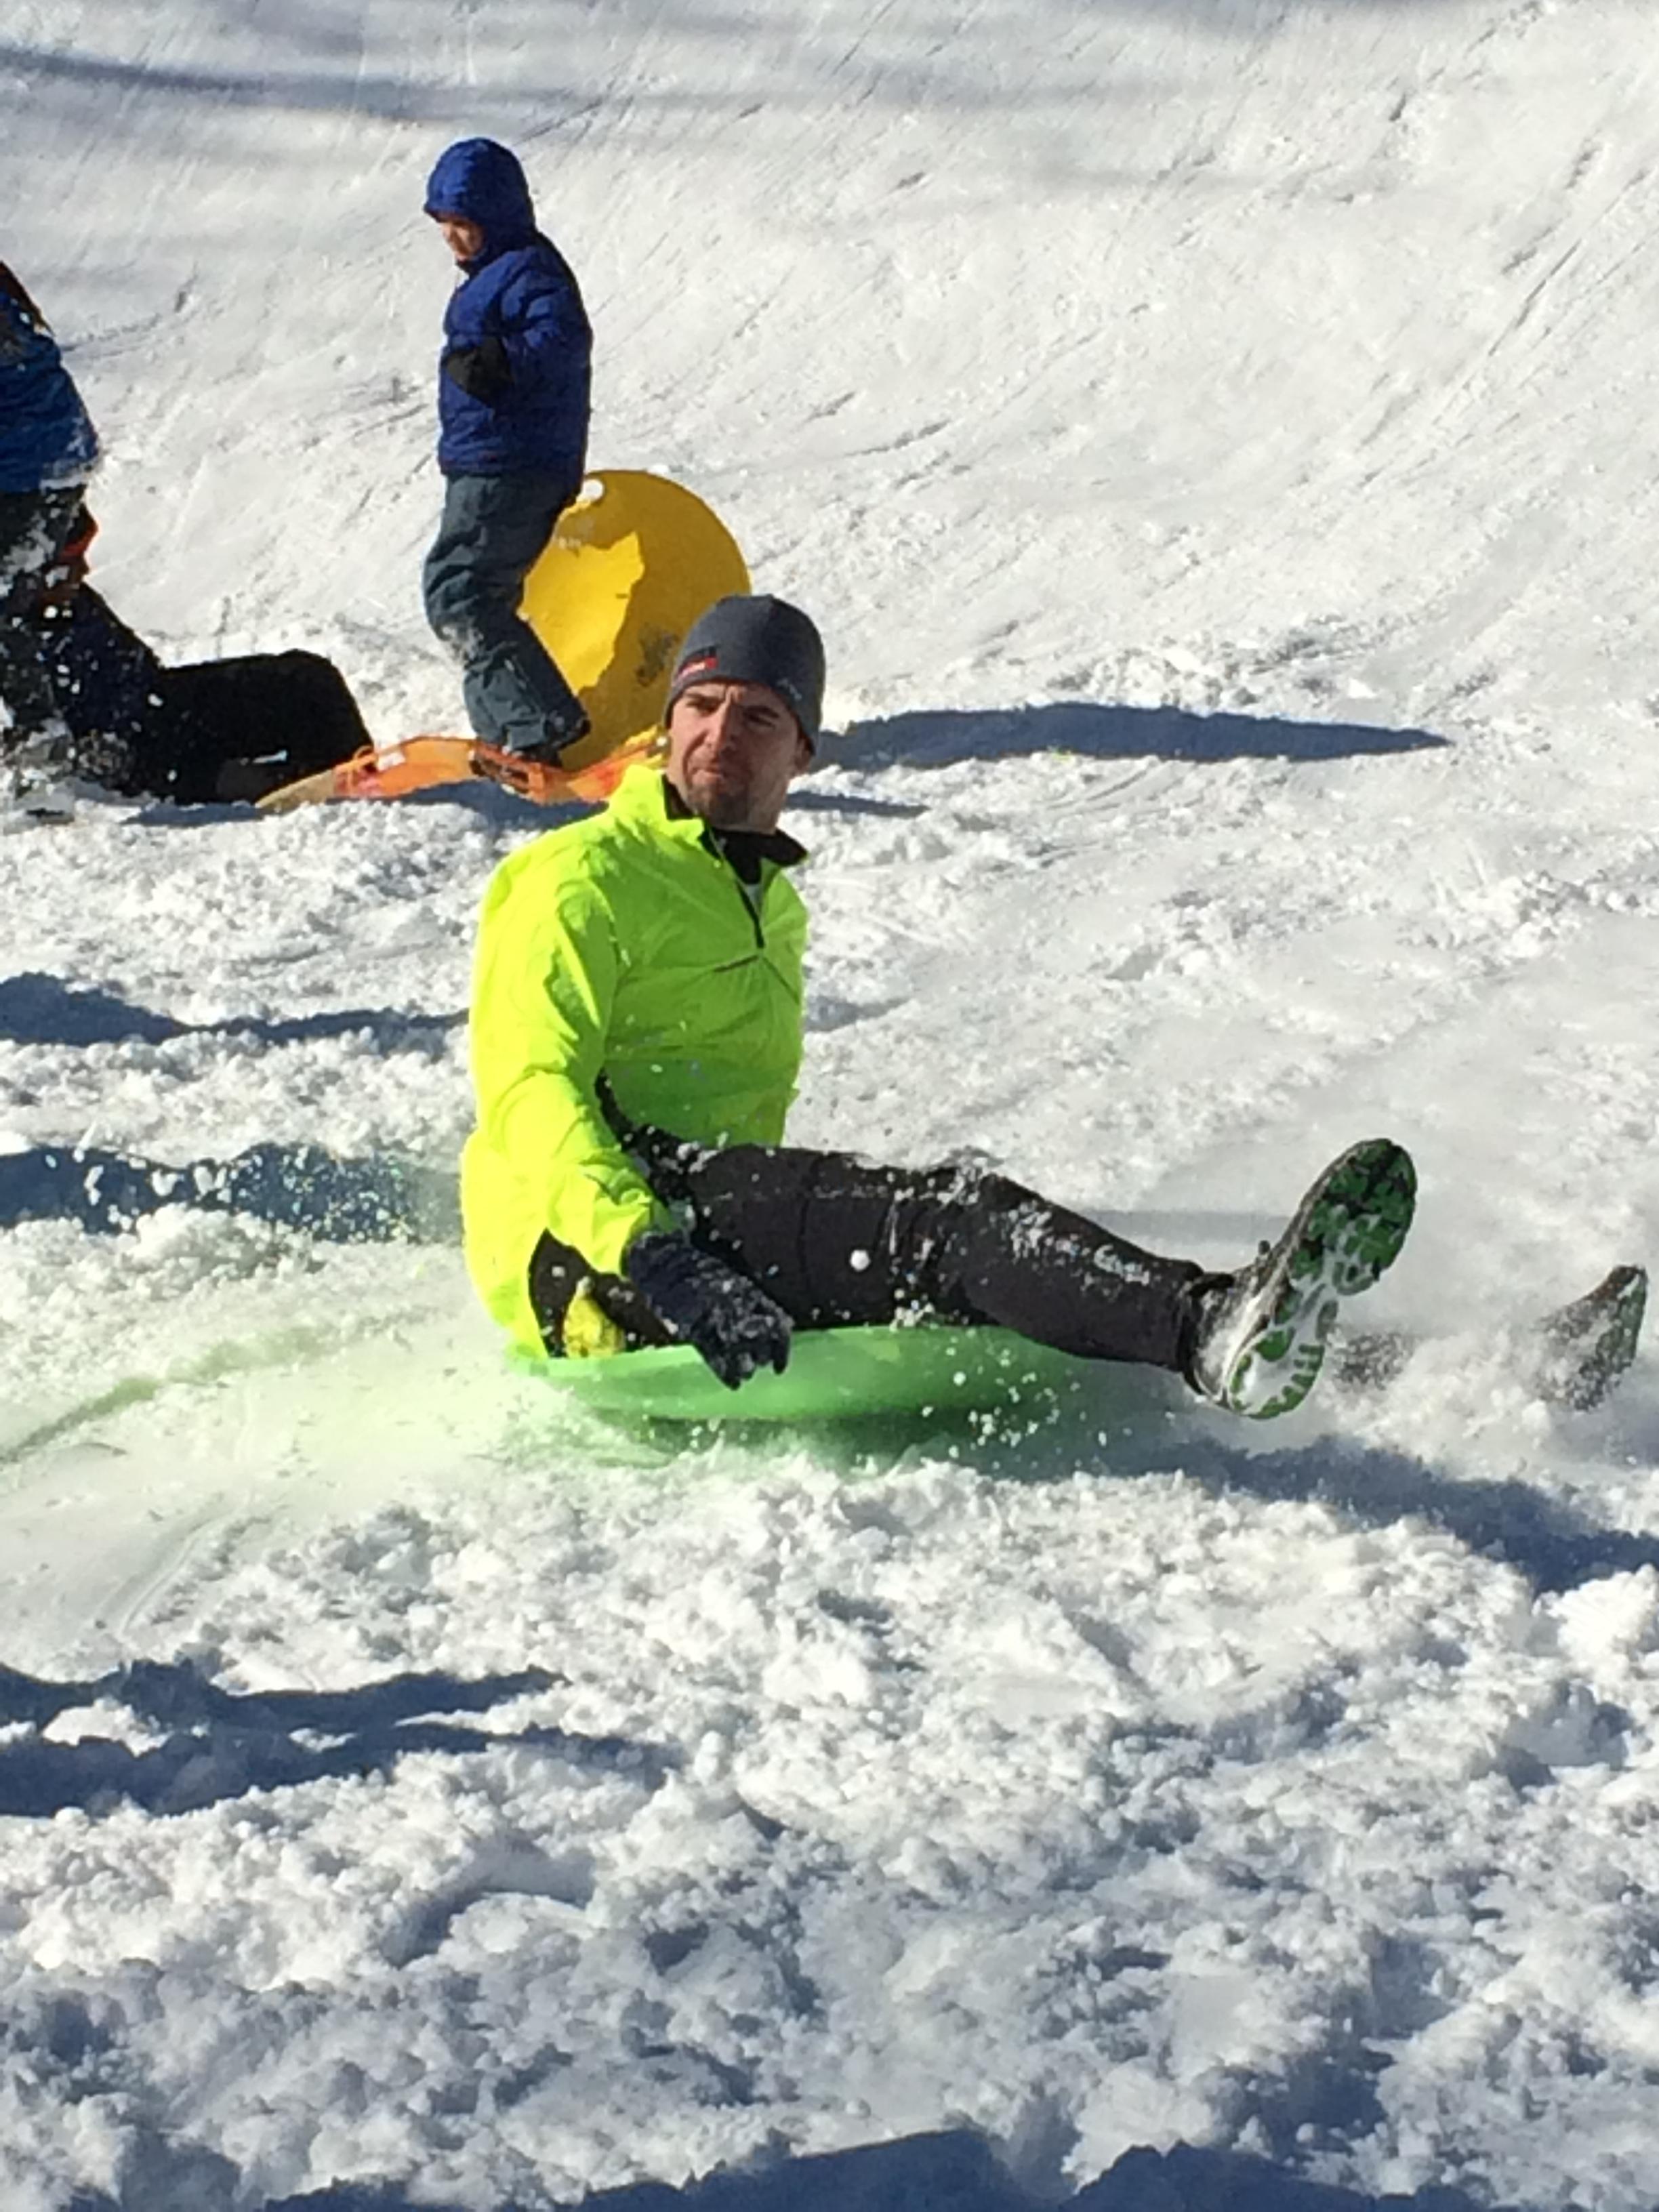 jeff sledding